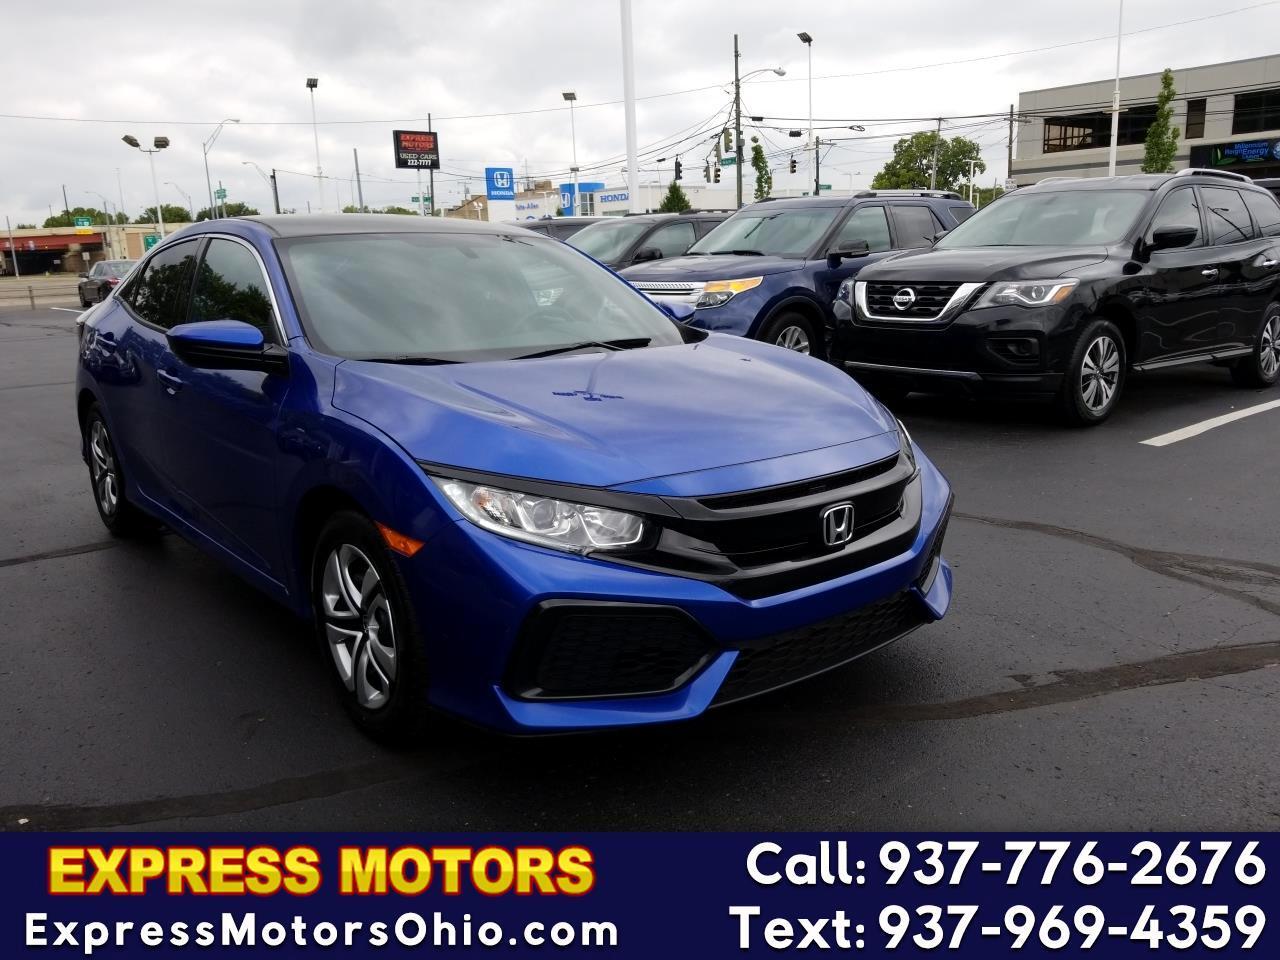 2017 Honda Civic Hatchback LX Manual